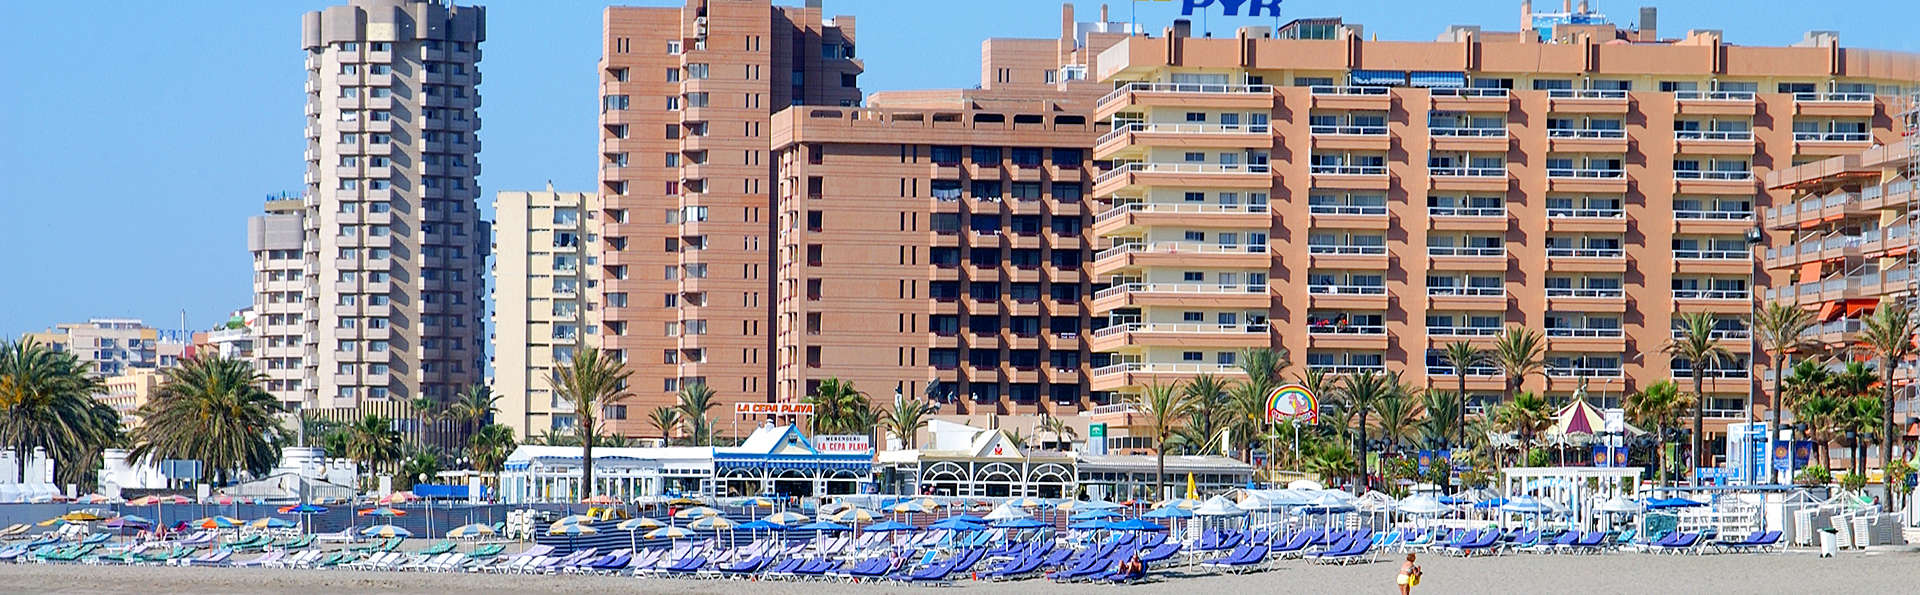 Hotel Apartamentos Pyr Fuengirola - EDIT_Exterior3.jpg